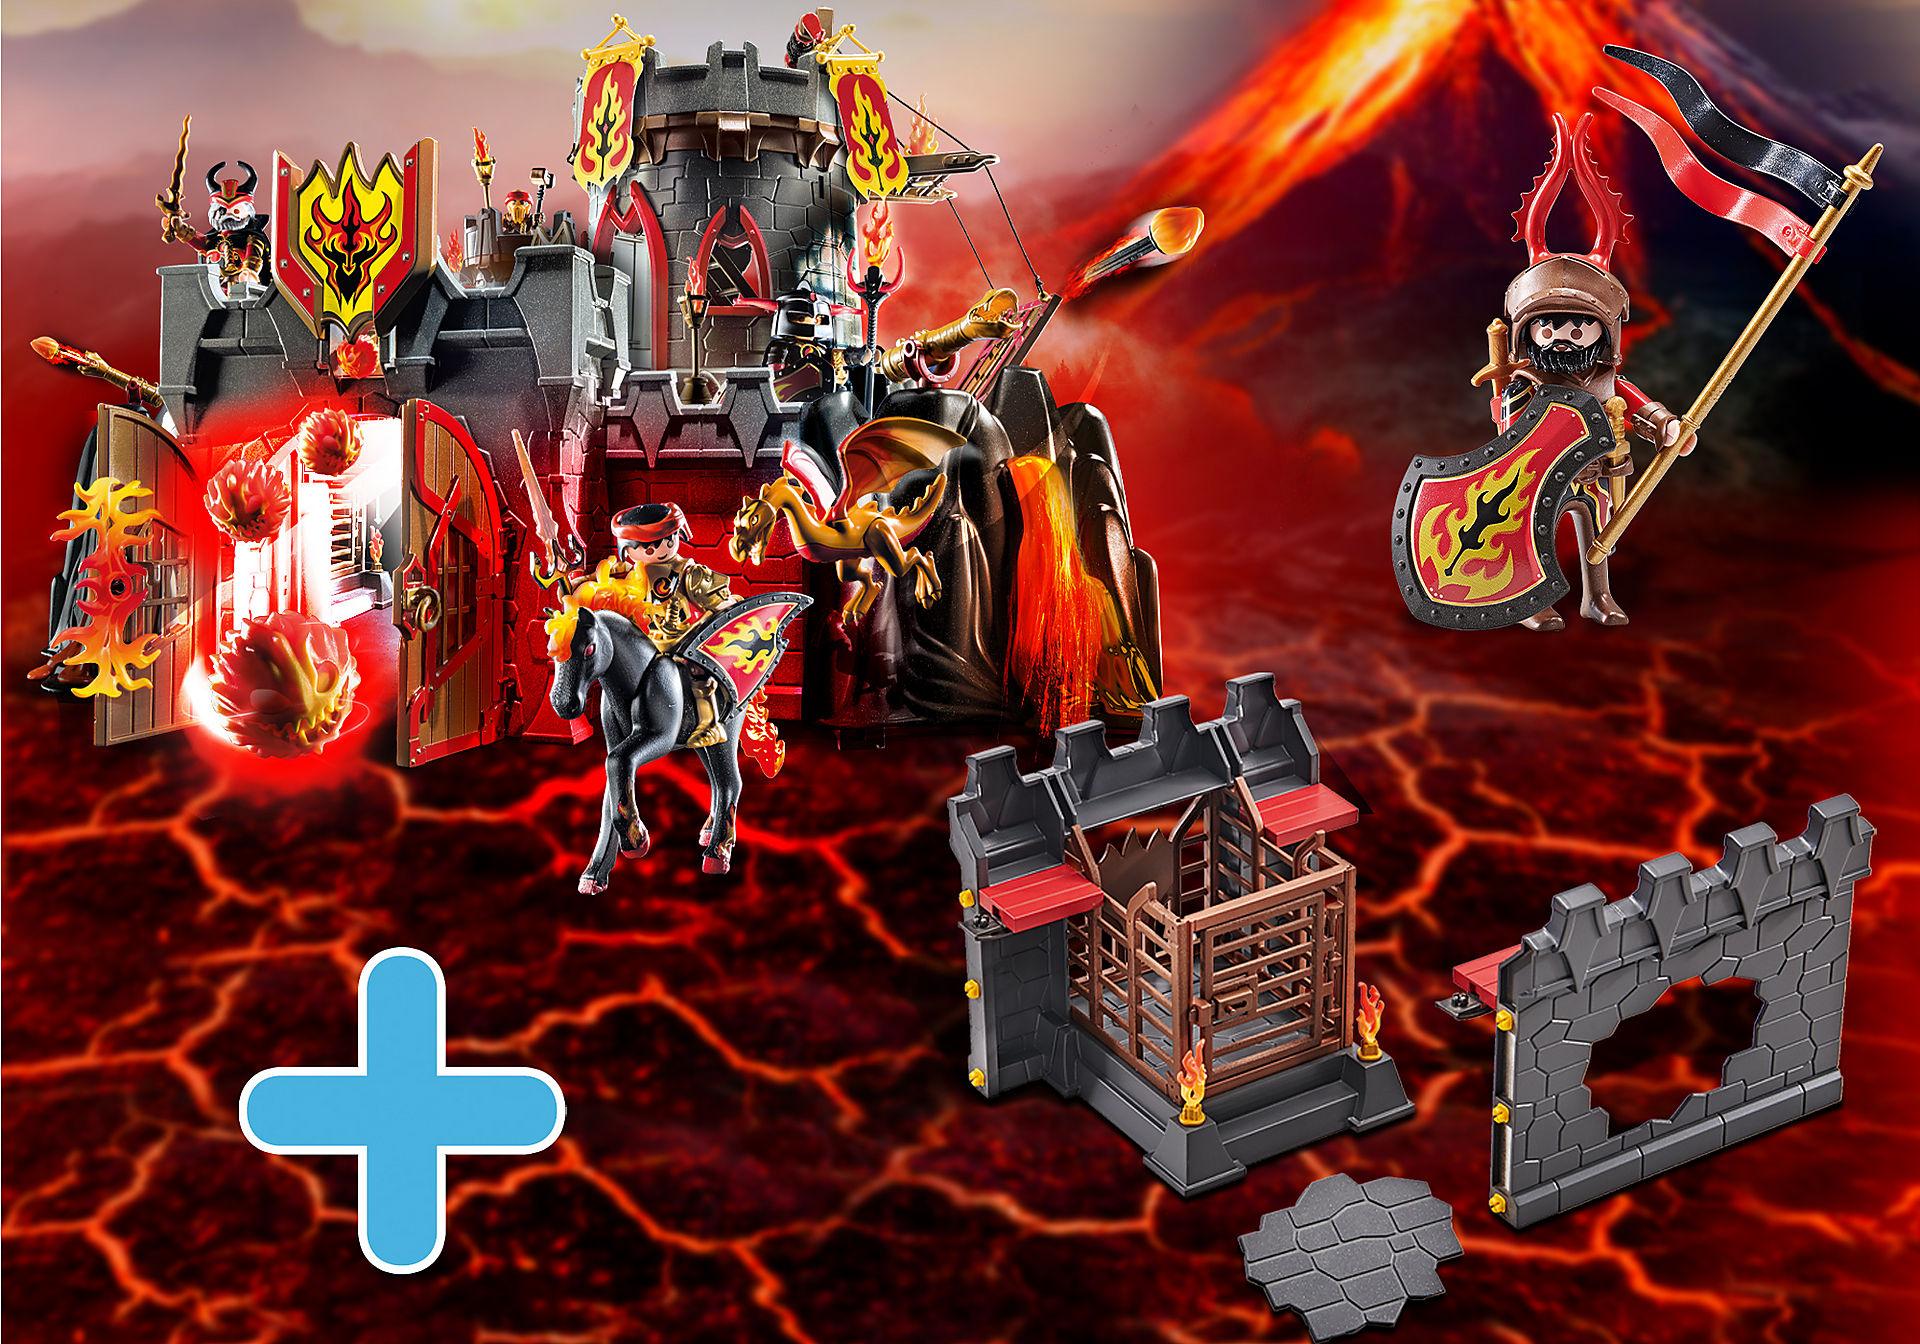 PM2101B Pack Promocional Os Bandidos de Burnham  zoom image1